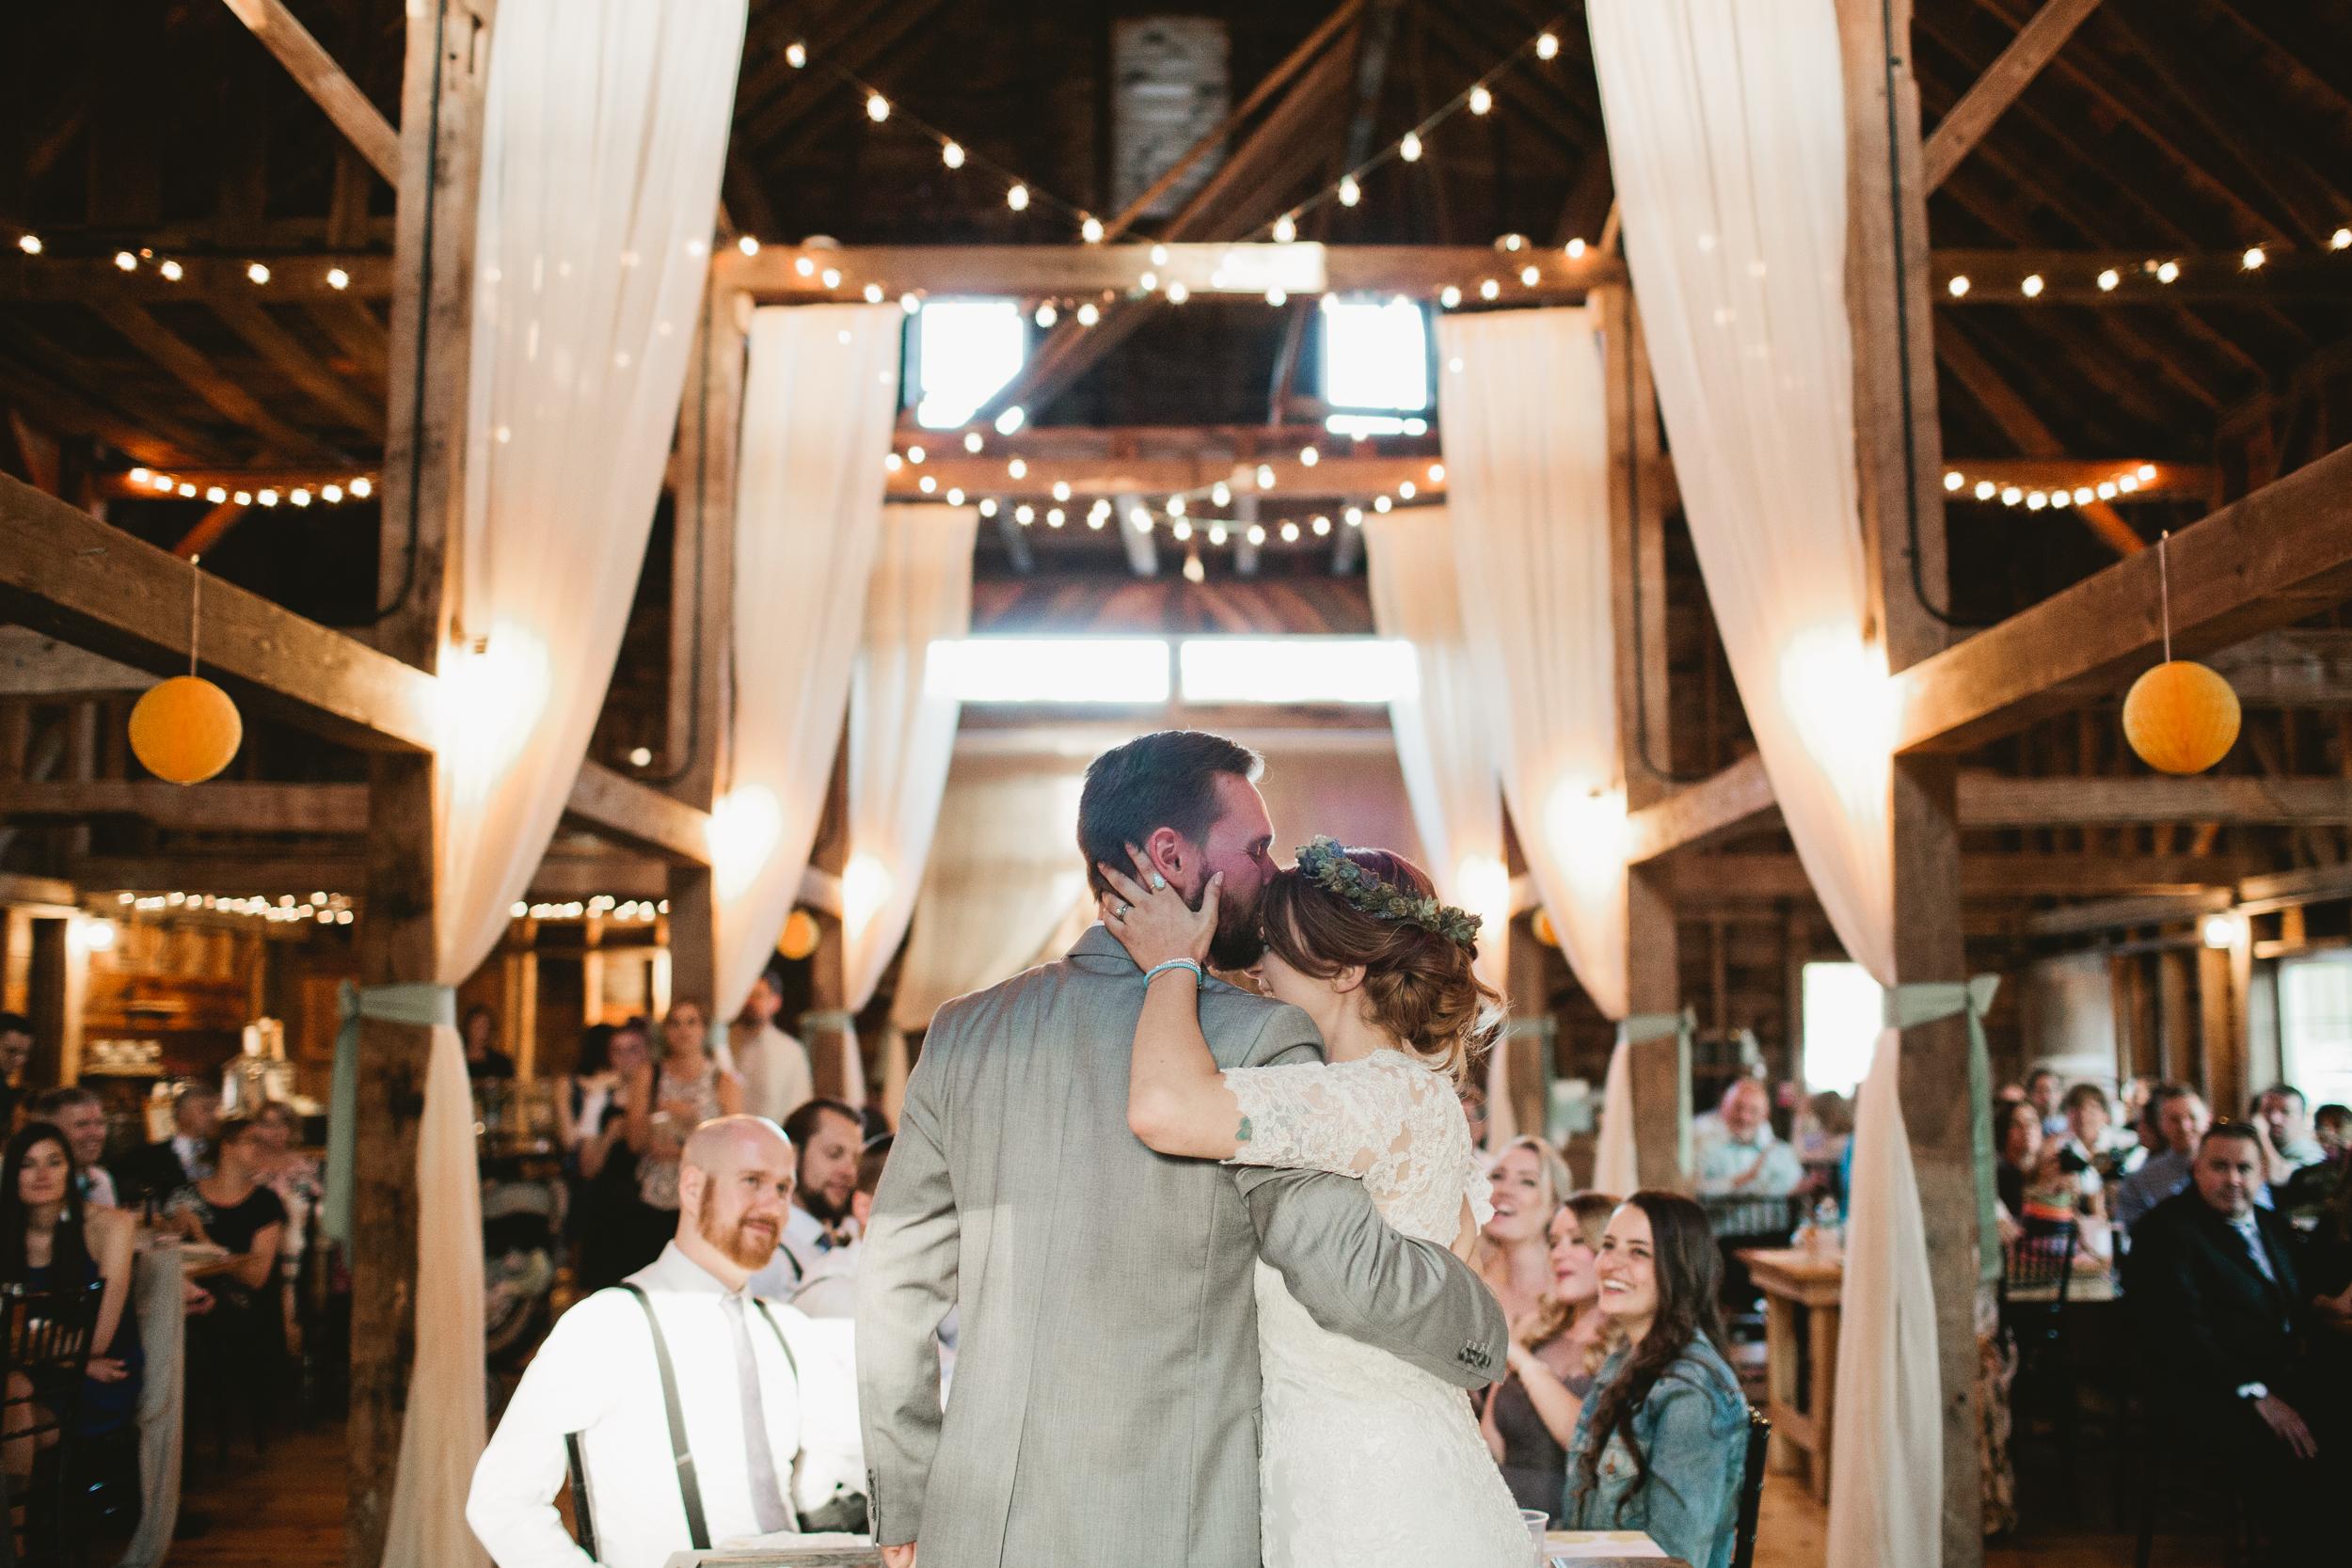 Spring-Meadows-Maine-Wedding-173.jpg